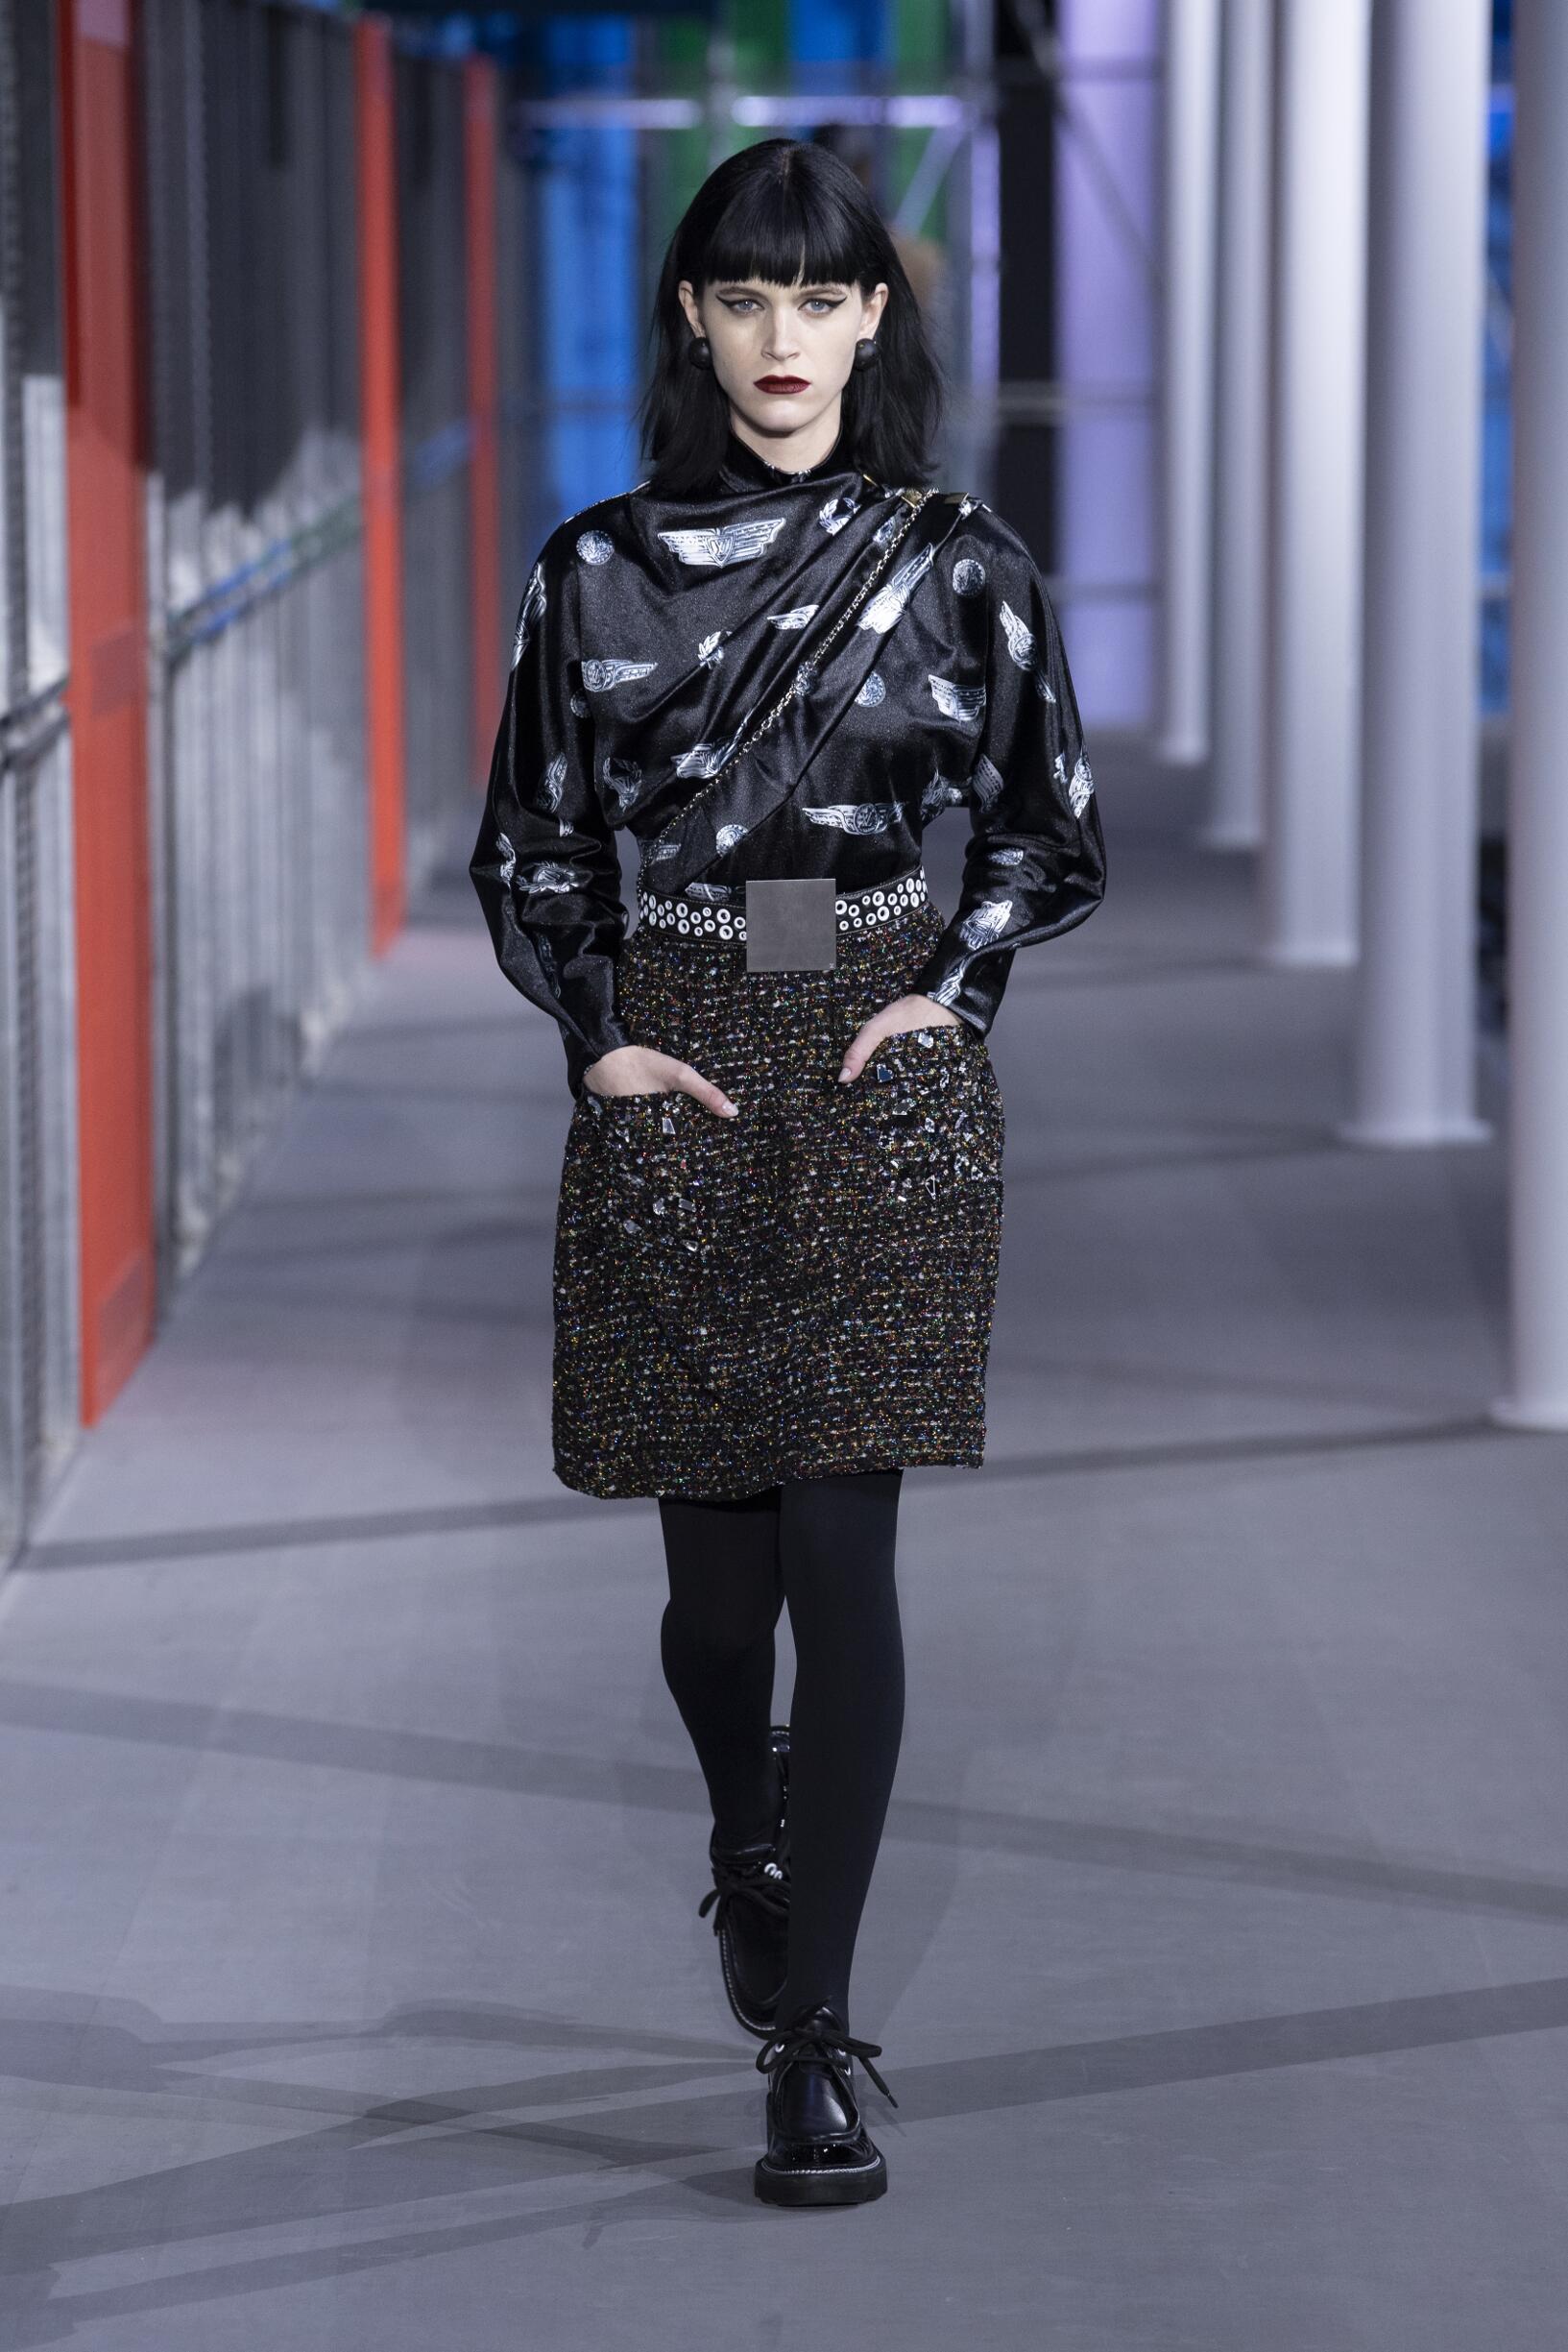 078c018262a FW 2019-20 Fashion Show Louis Vuitton